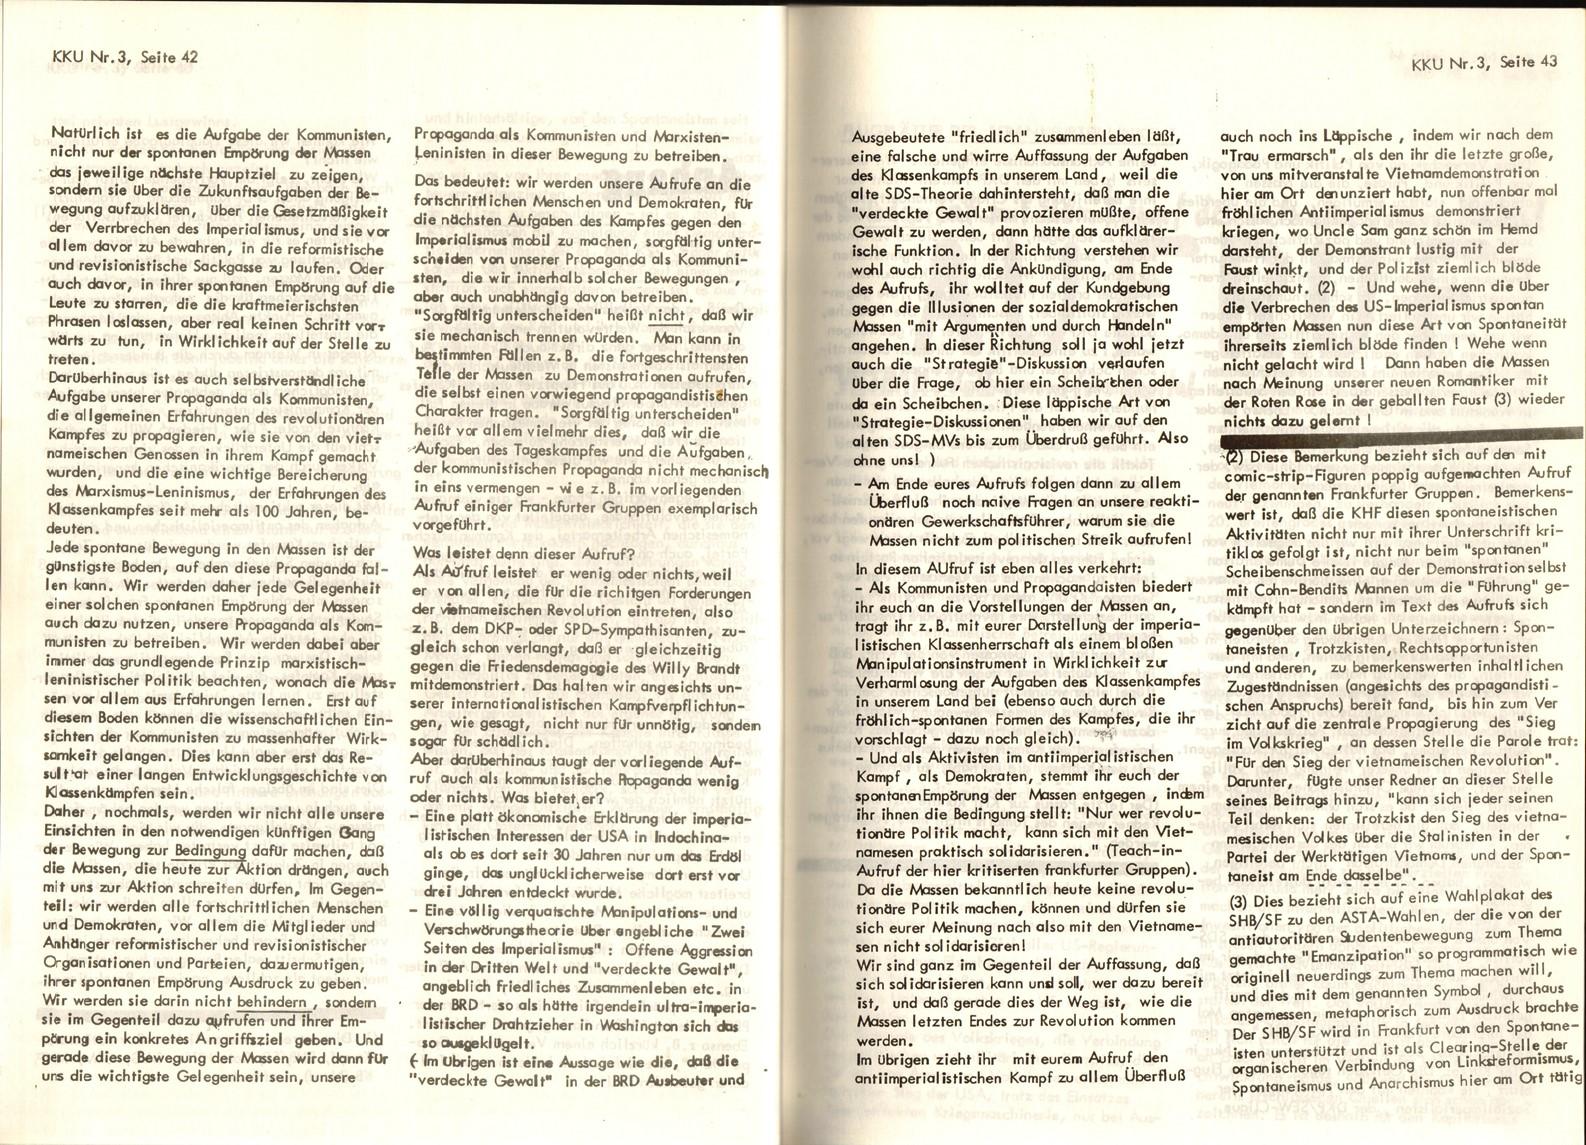 Frankfurt_Offenbach_KG_Kampf_Kritik_Umgestaltung_1973_03_23